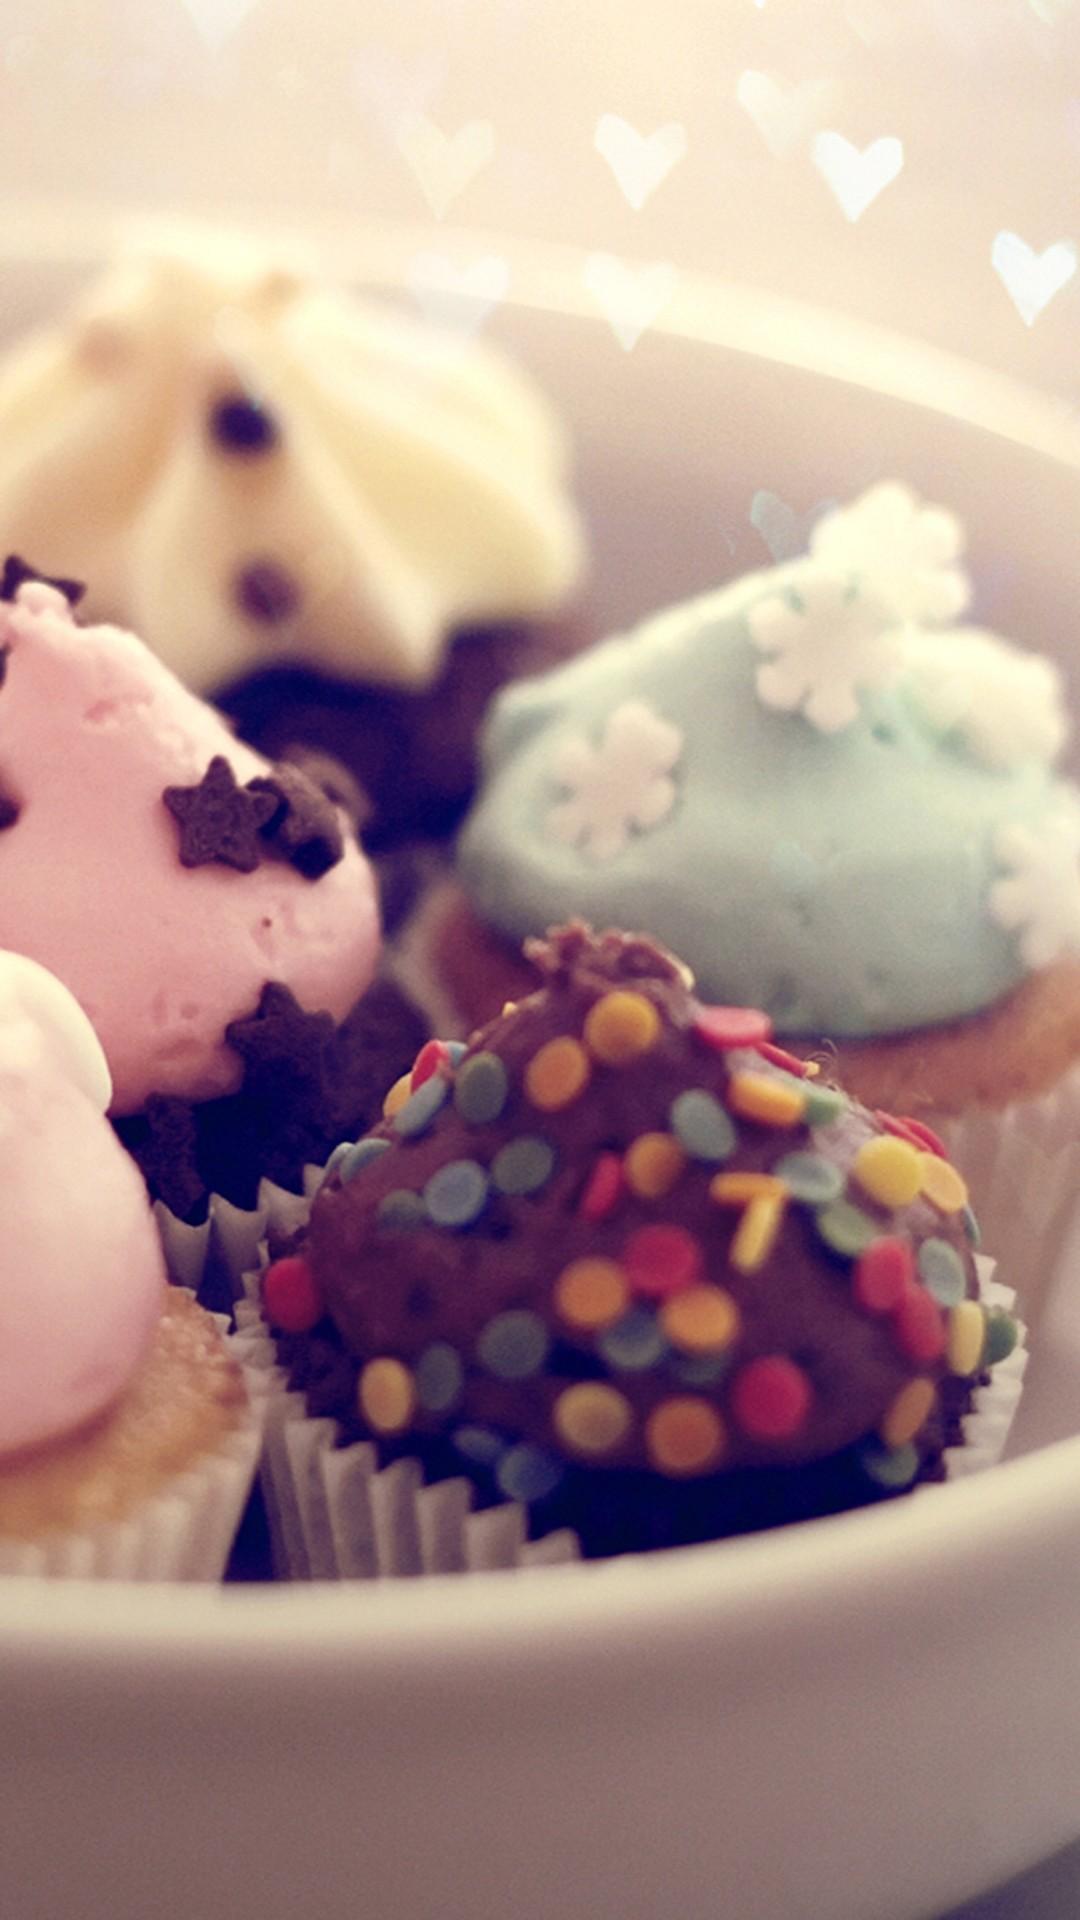 Mint Chocolate Cupcake Desert iPhone 6 Plus HD Wallpaper